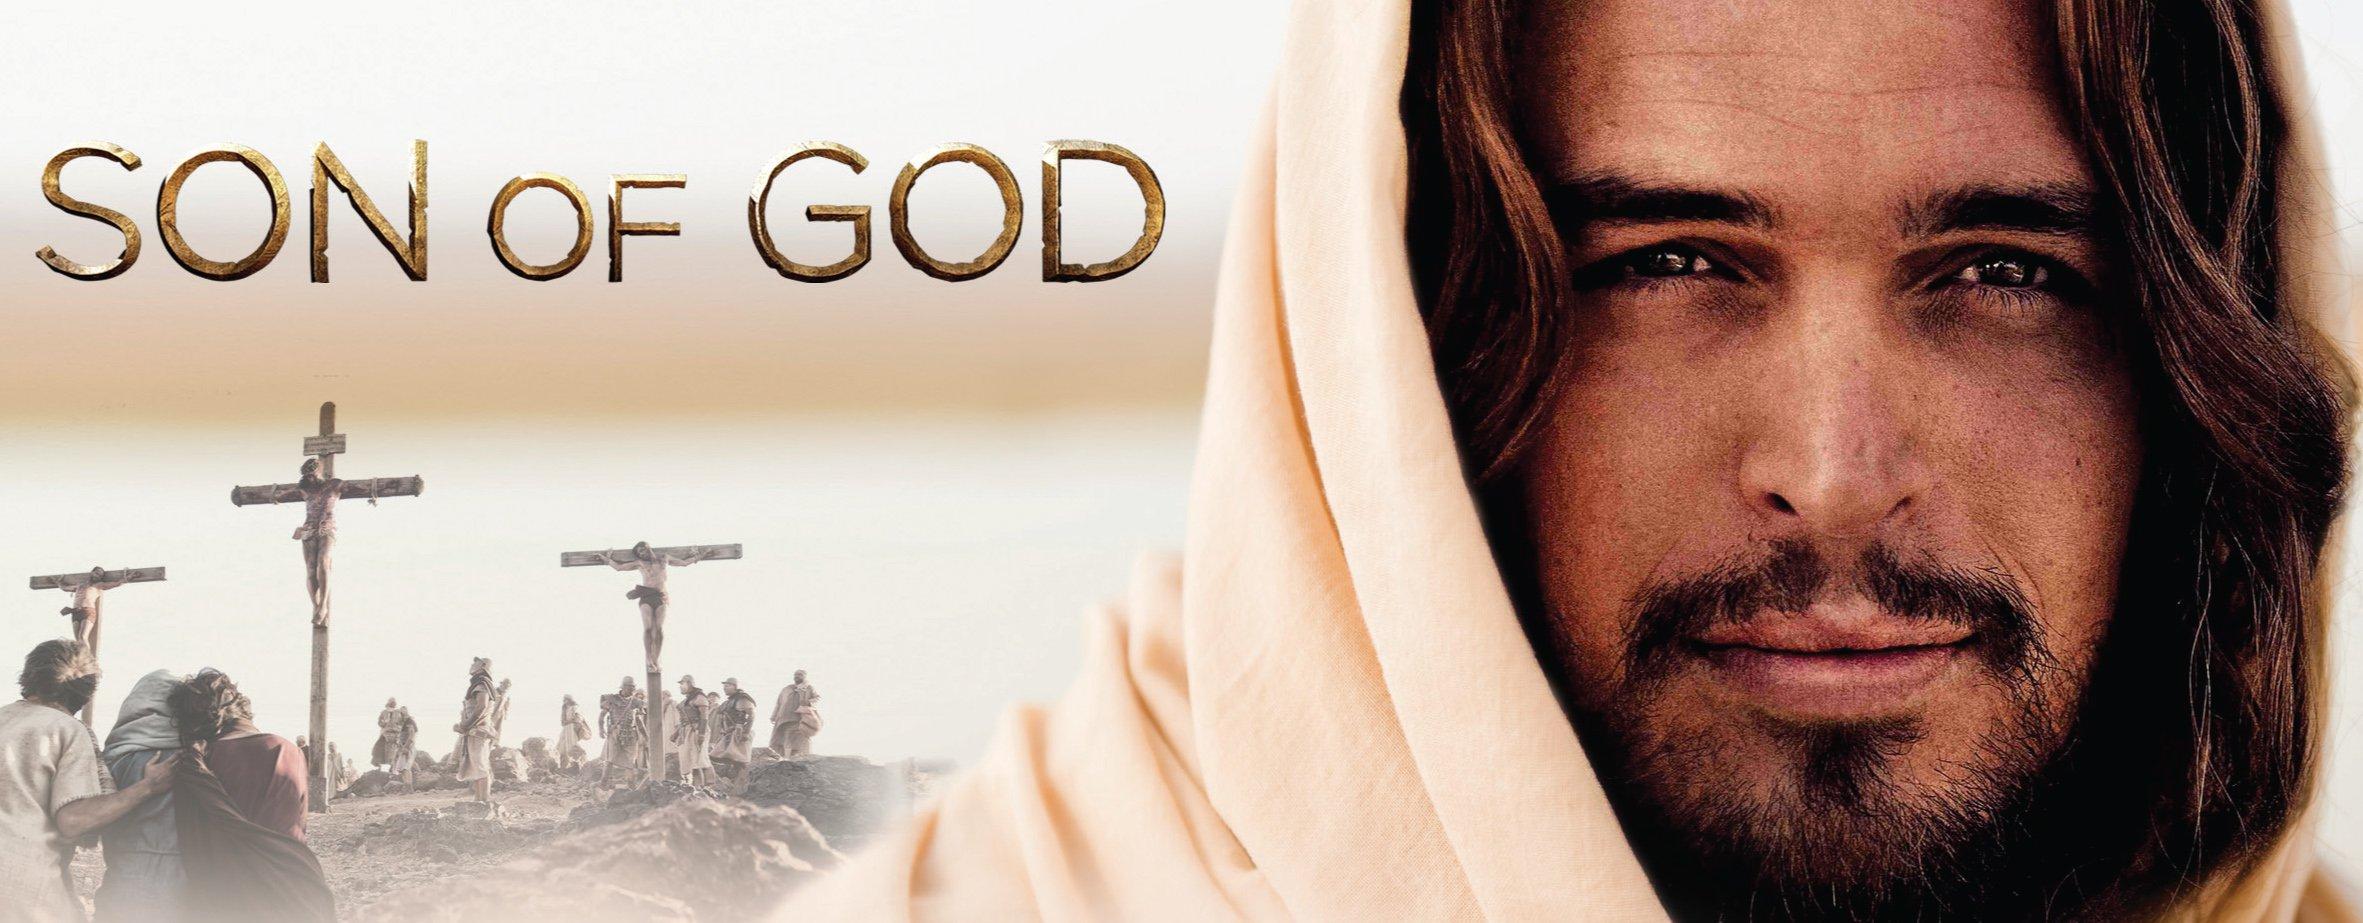 Son Of God Drama Religion Movie Film Christian God Son Jesus Poster